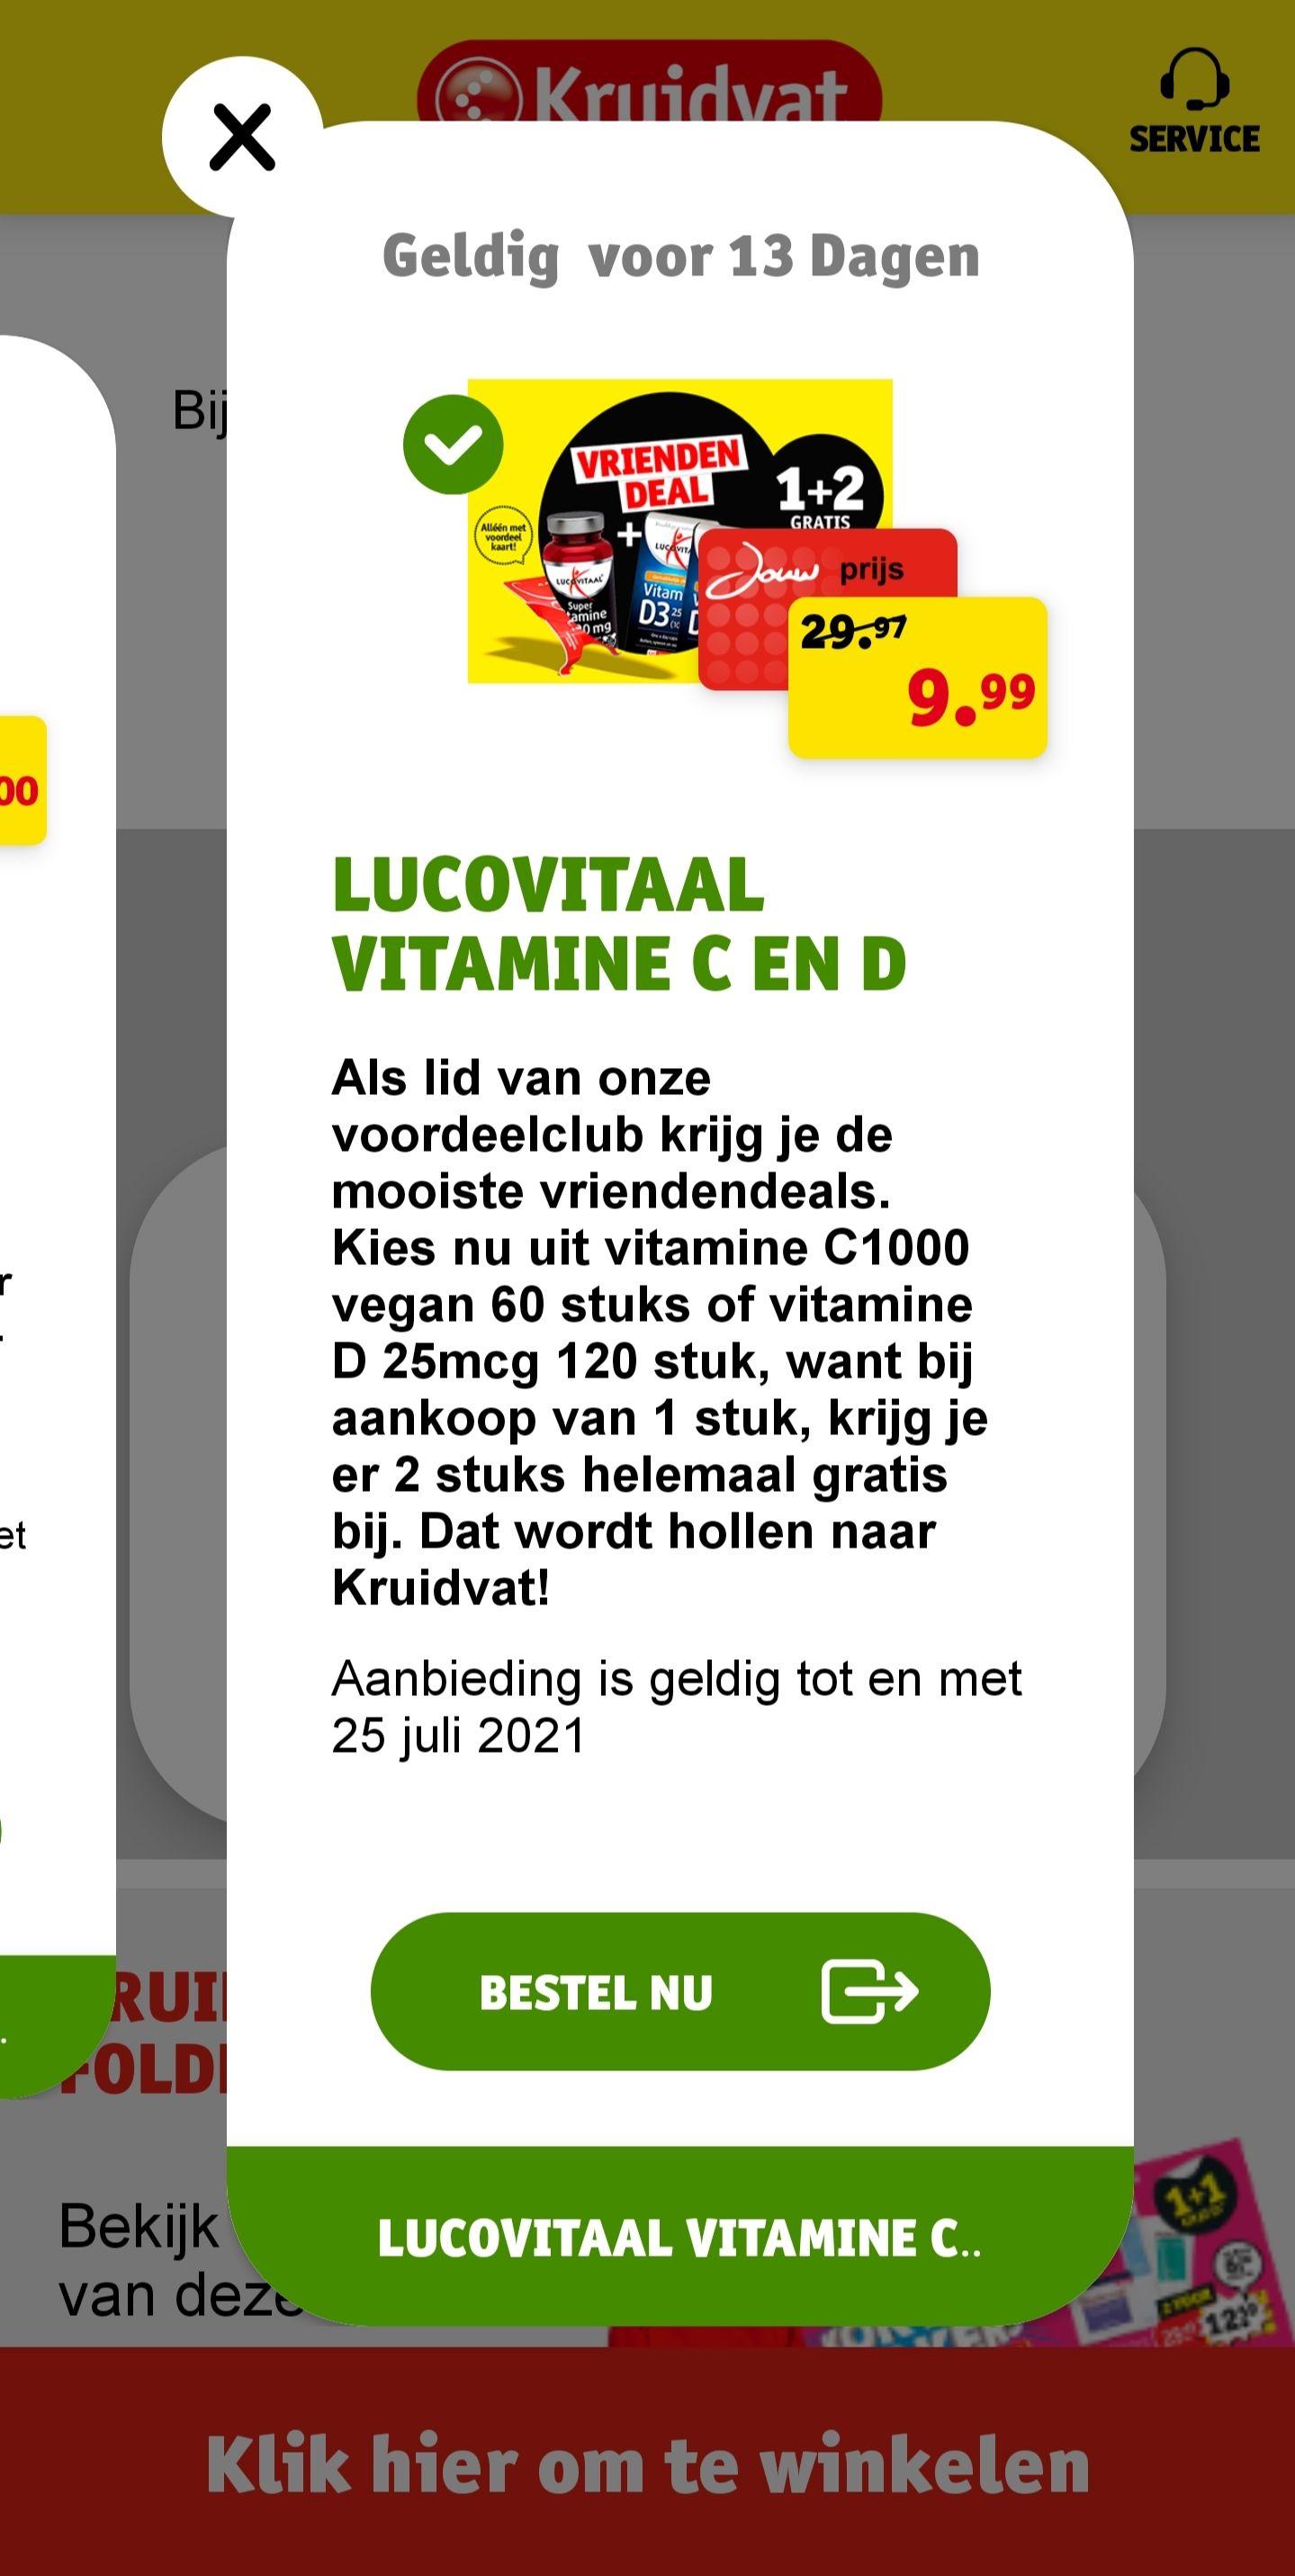 Lucovitaal vitamine C1000 en/of vitamine D, 3 halen 1 betalen @Kruidvat